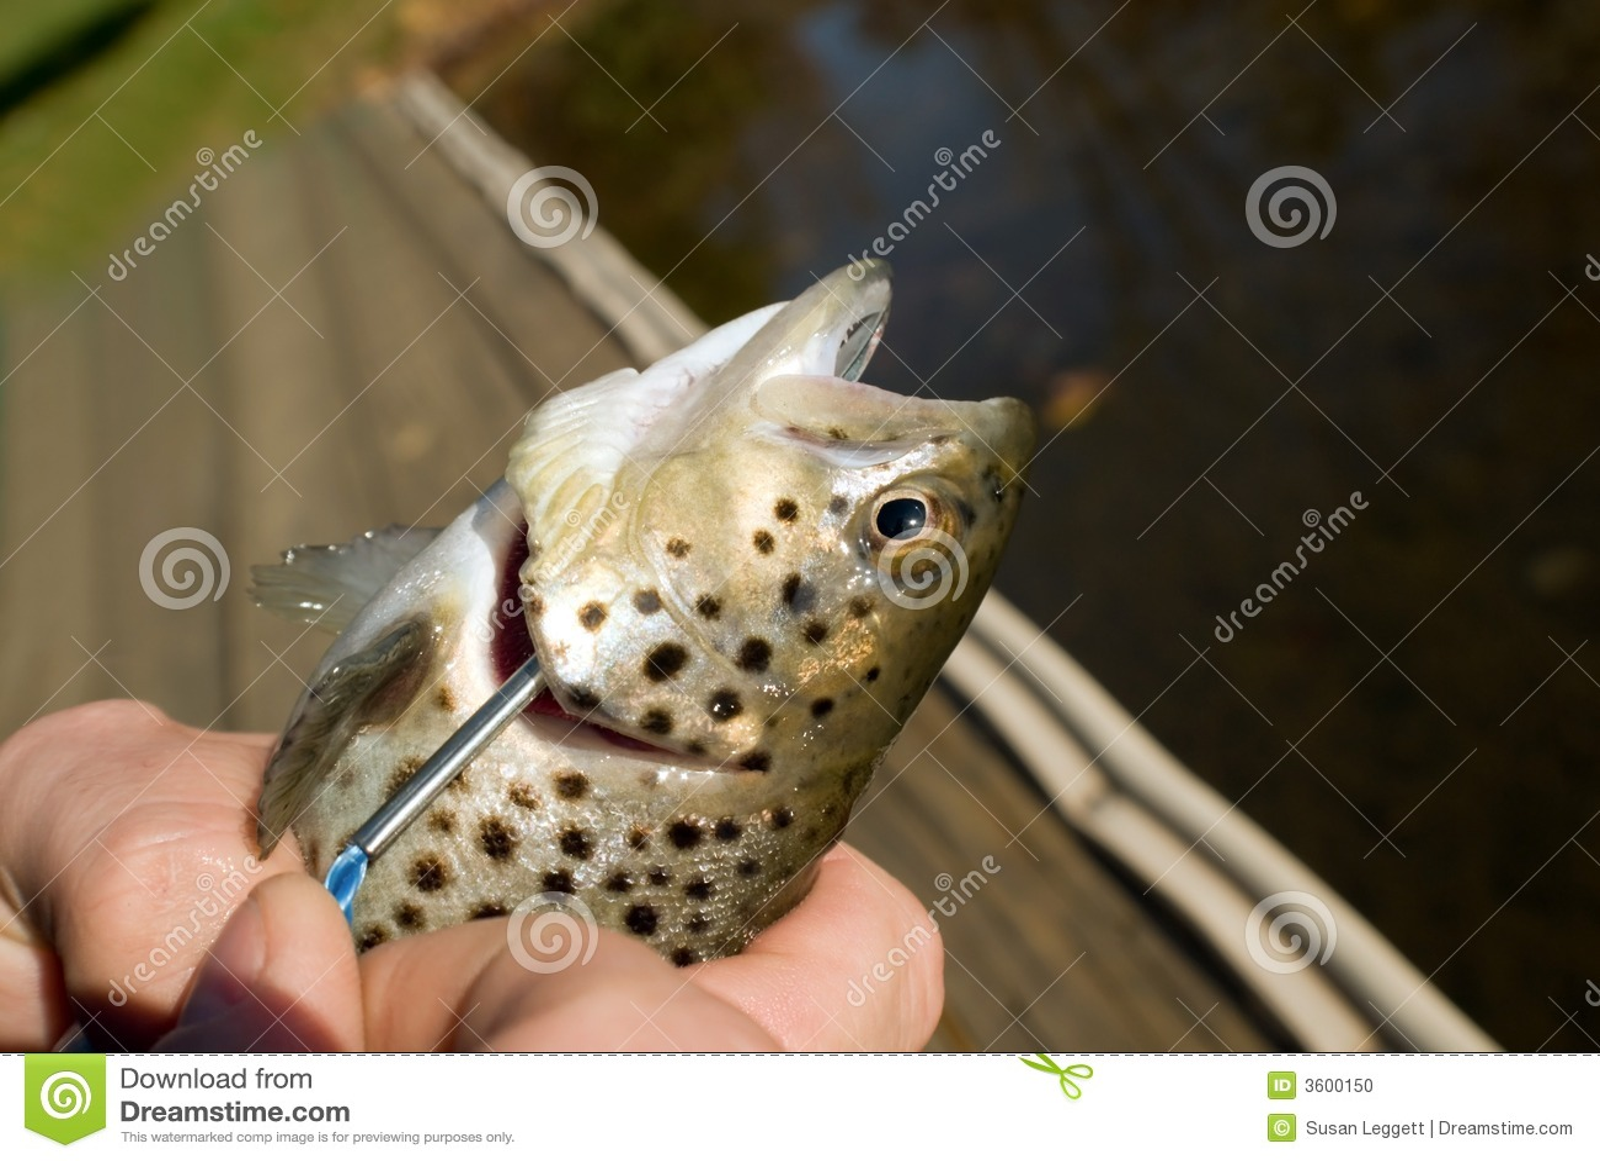 Fresh fish put on stringer